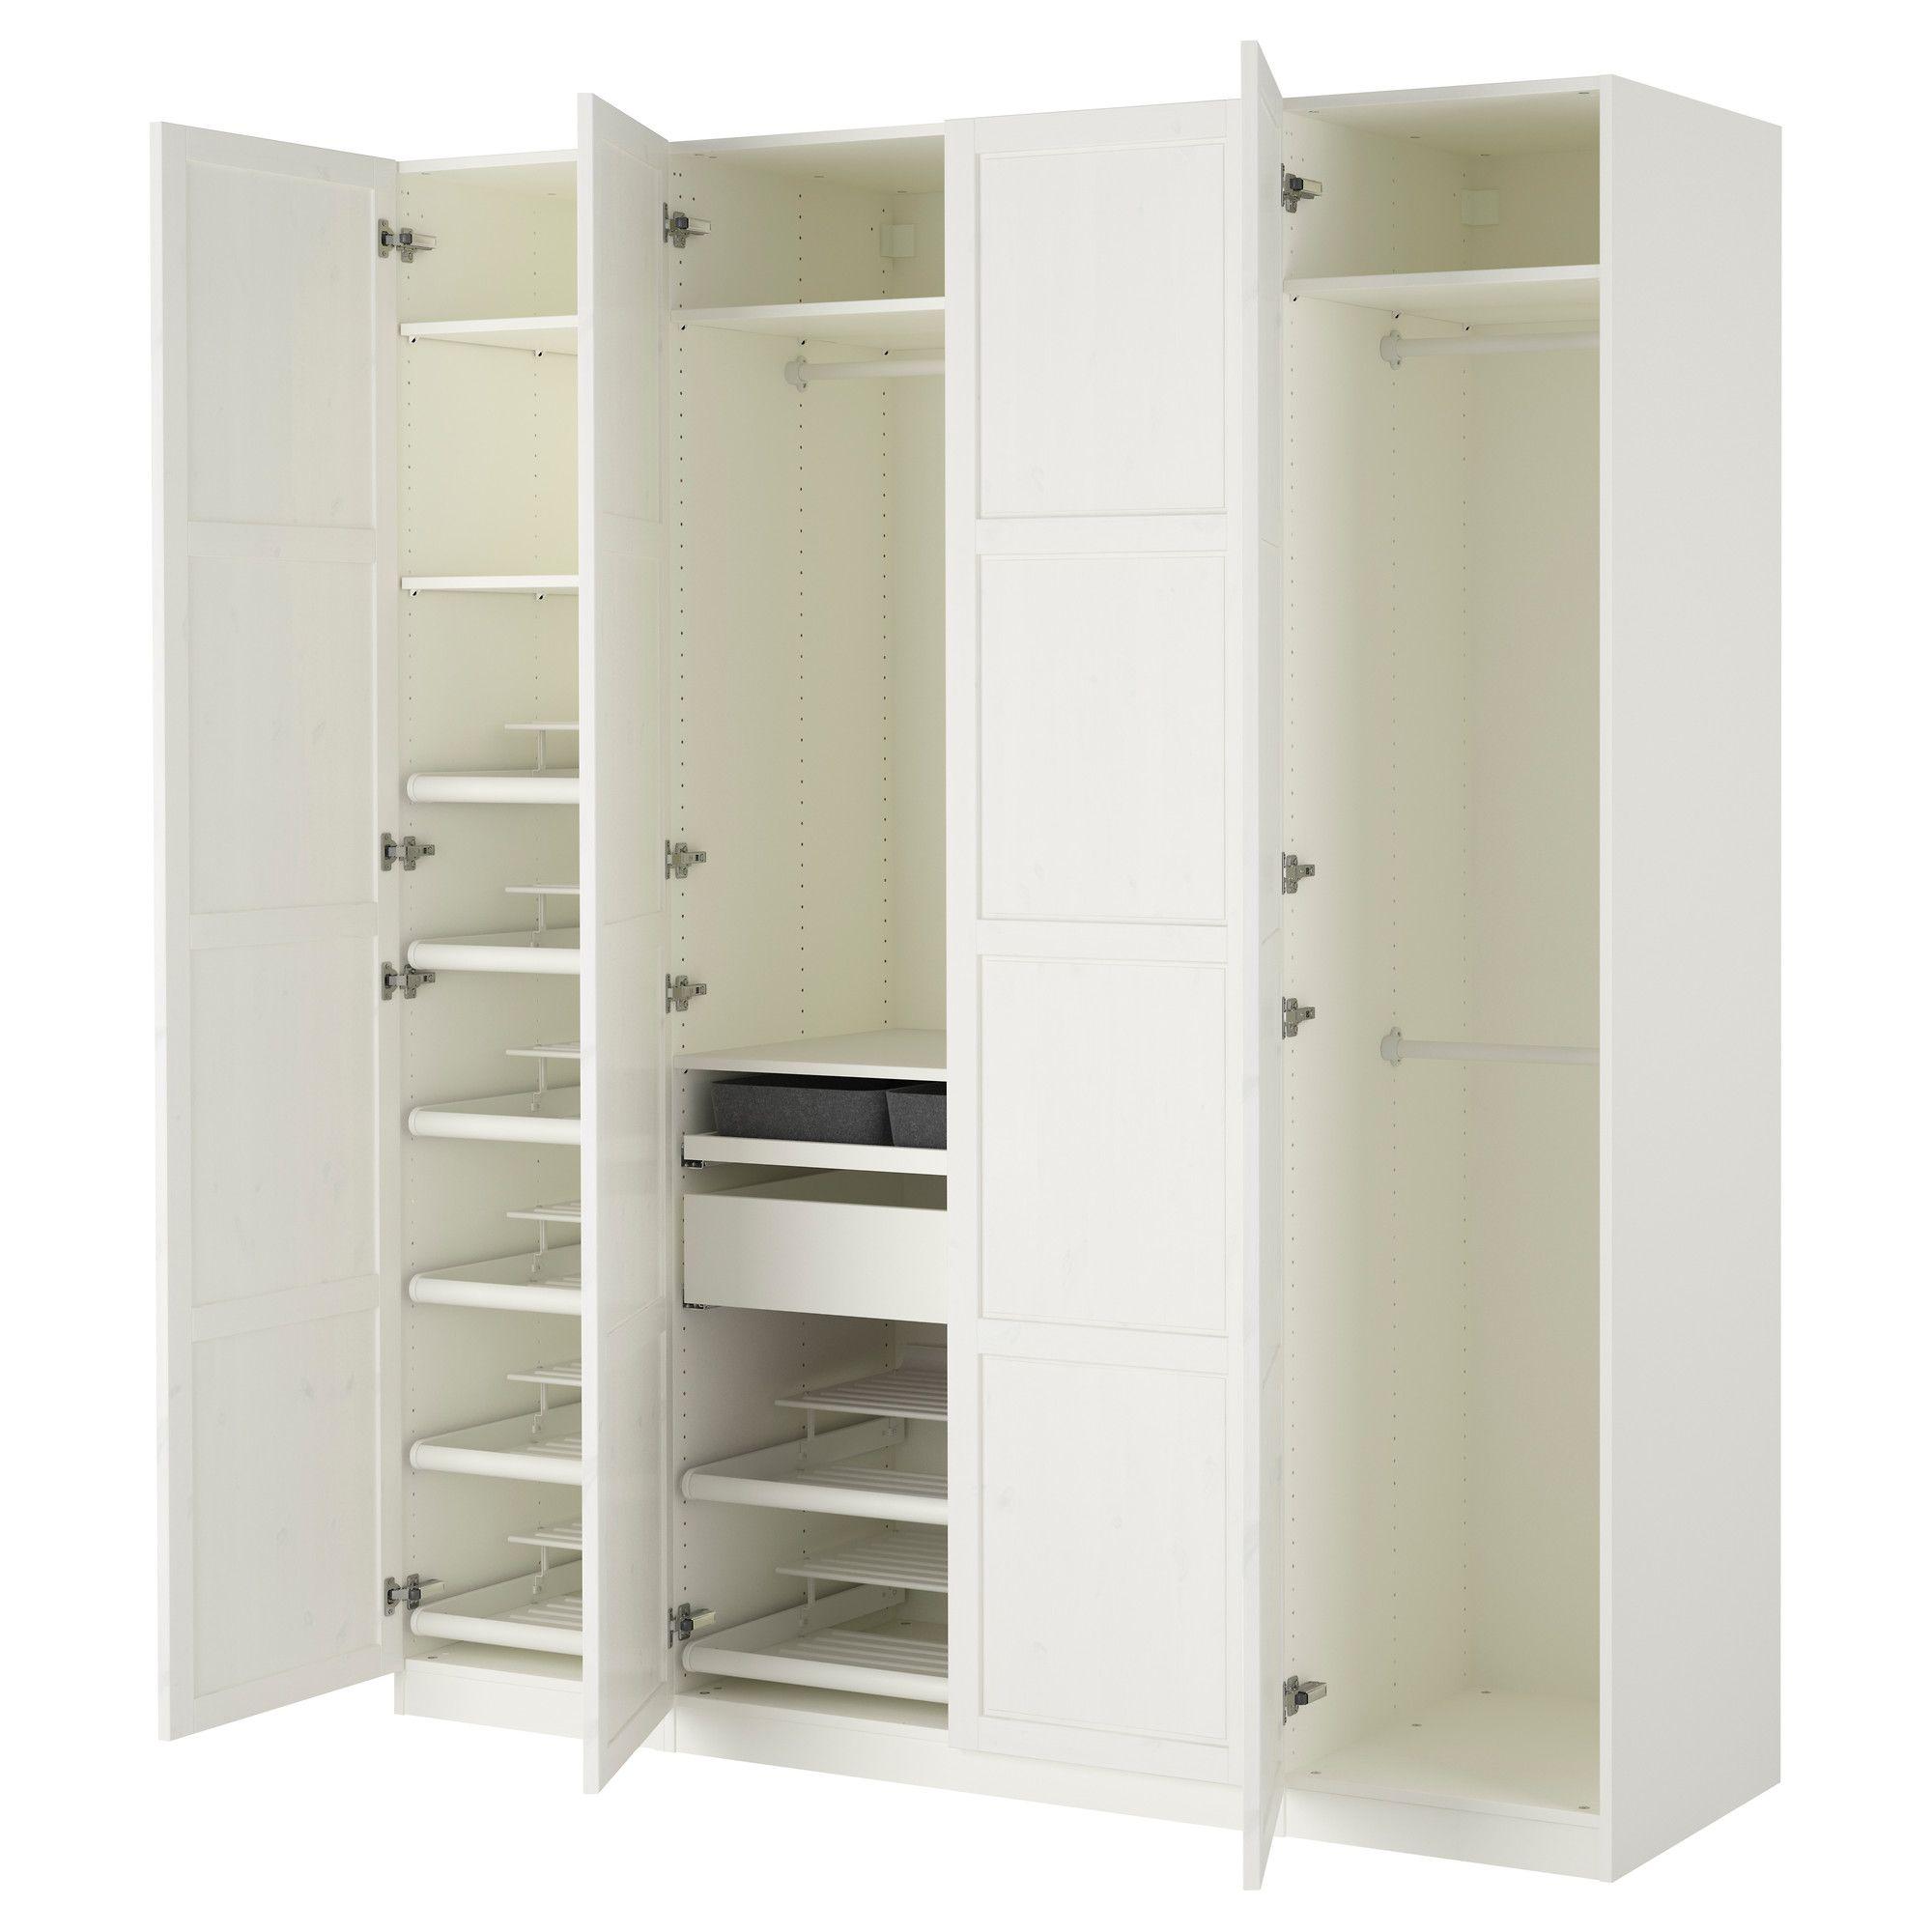 US Furniture and Home Furnishings Ikea pax, Ikea pax